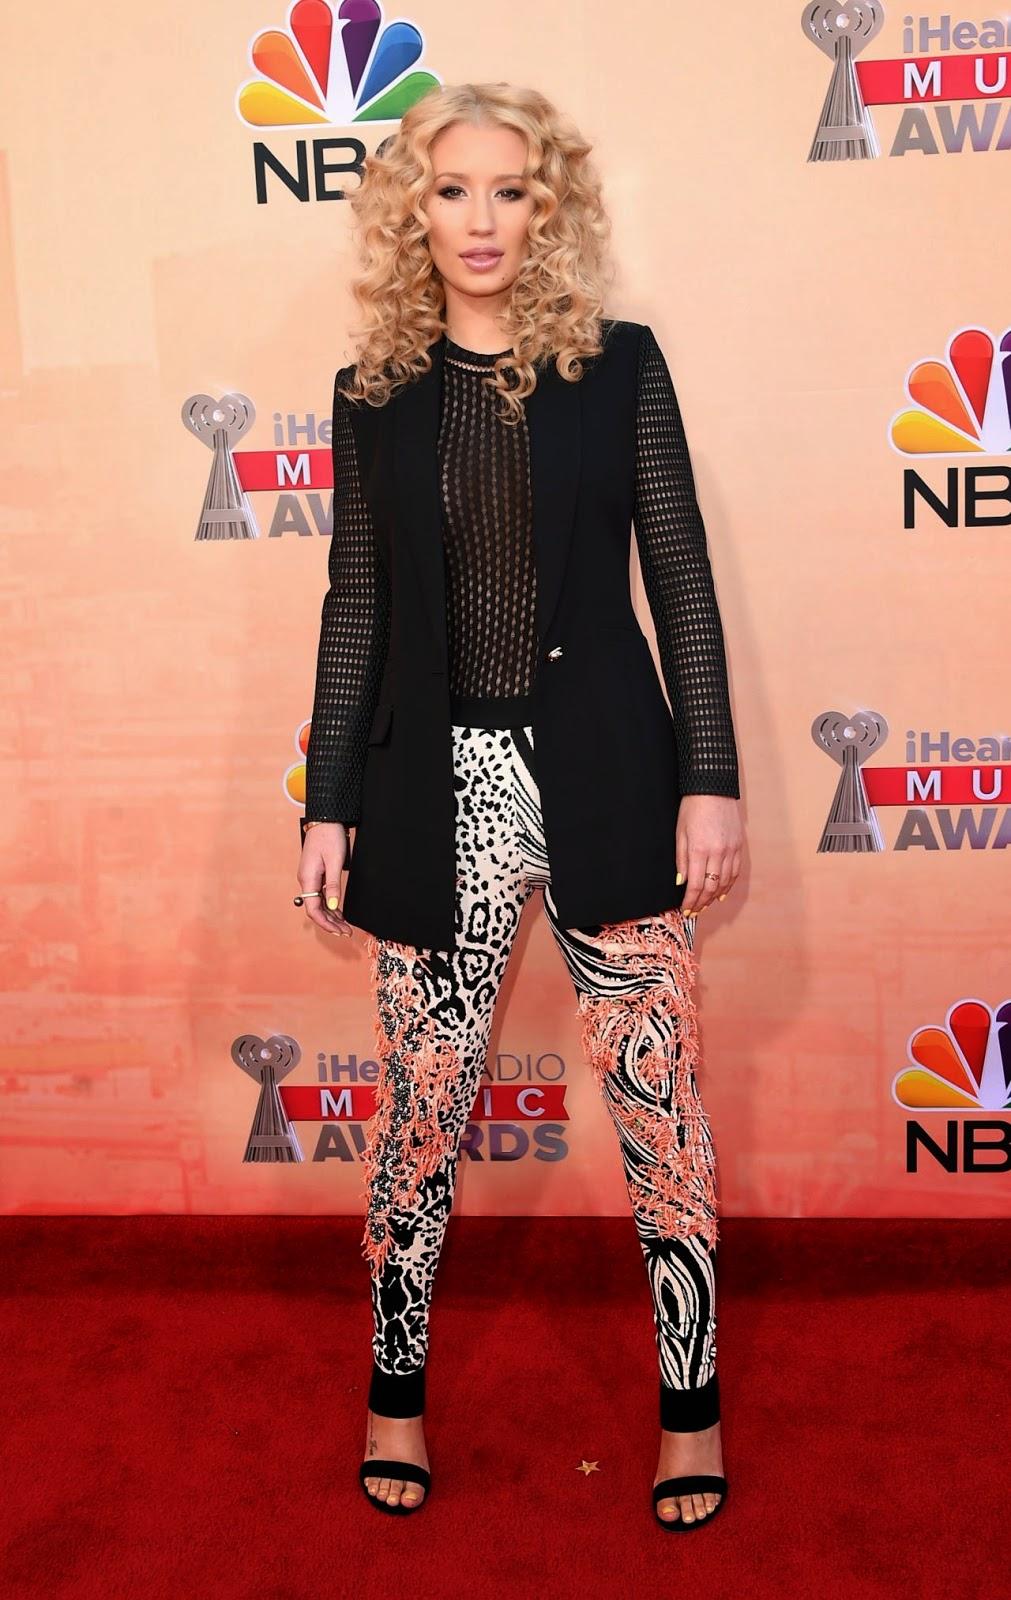 Iggy Azalea and Jennifer Hudson perform at the 2015 iHeartRadio Music Awards in LA